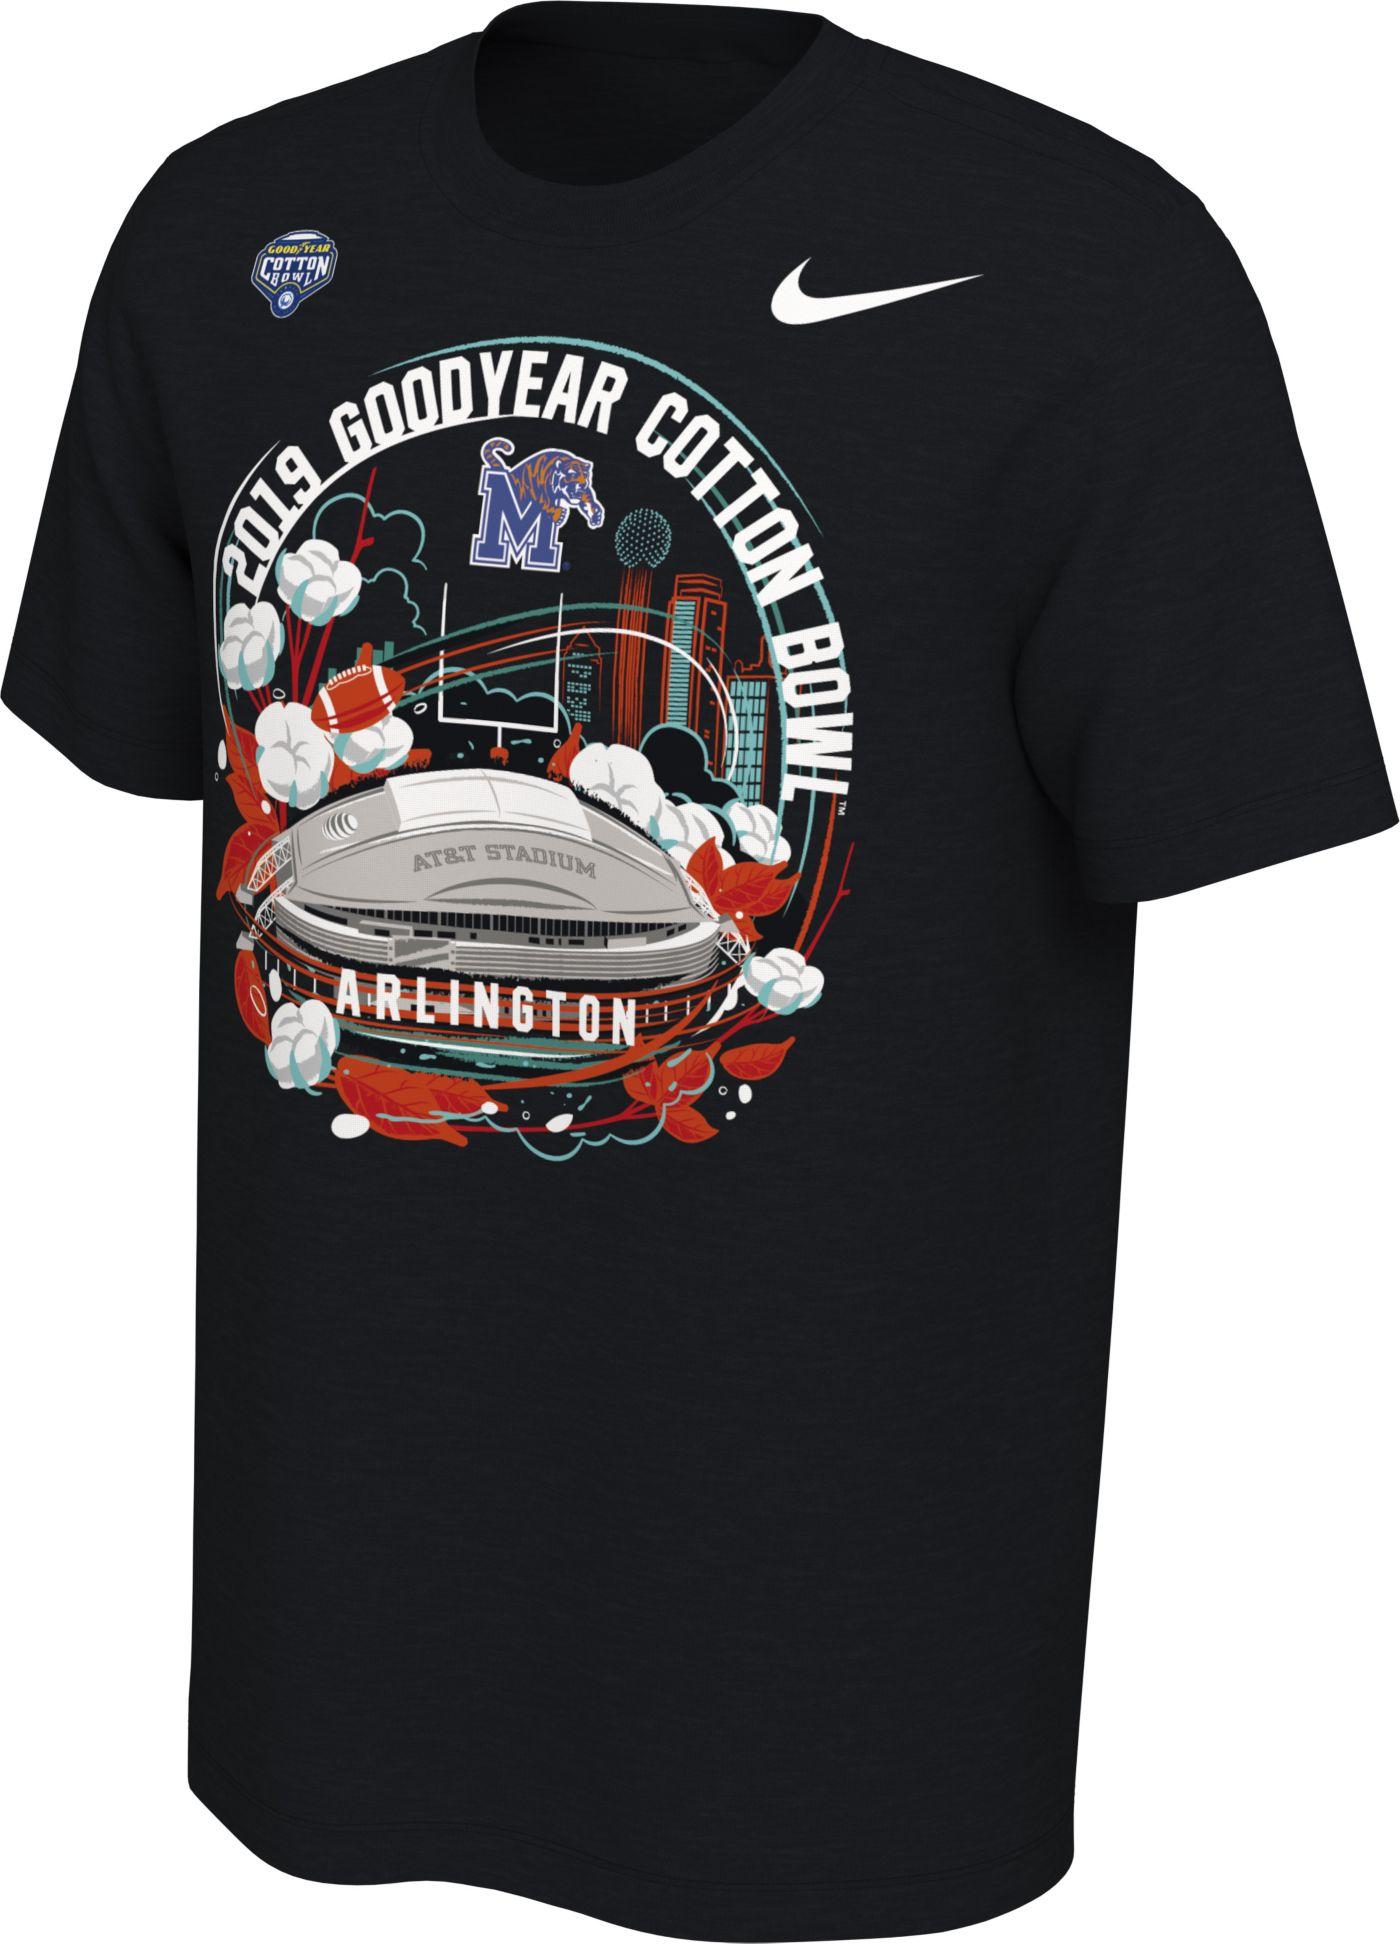 Nike Men's Memphis Tigers 2019 Goodyear Cotton Bowl Bound Stadium T-Shirt